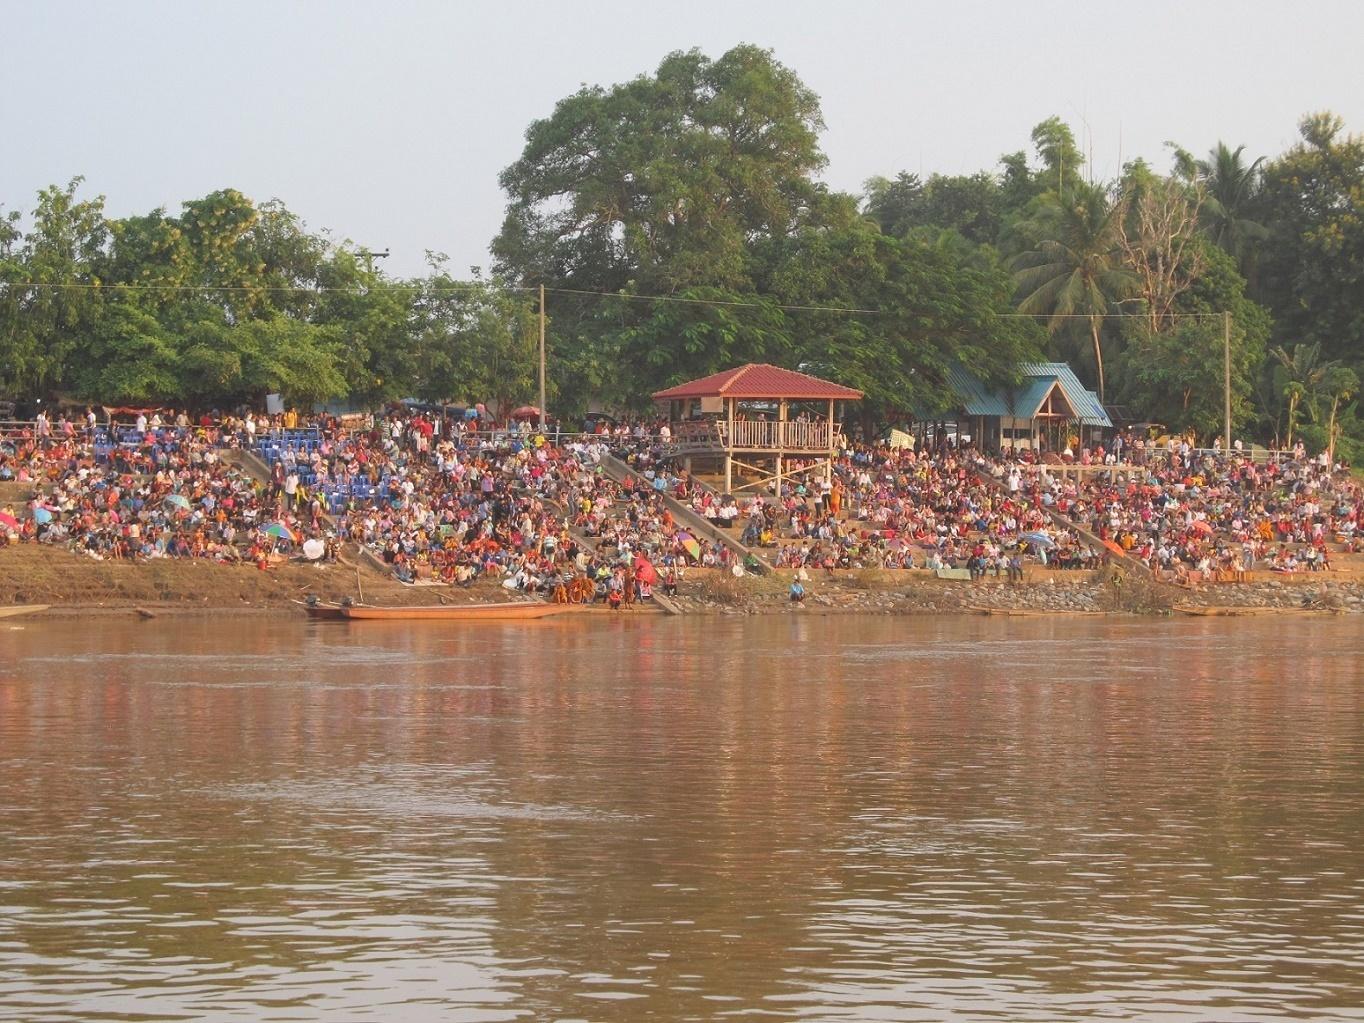 Mekong - slavnost na břehu